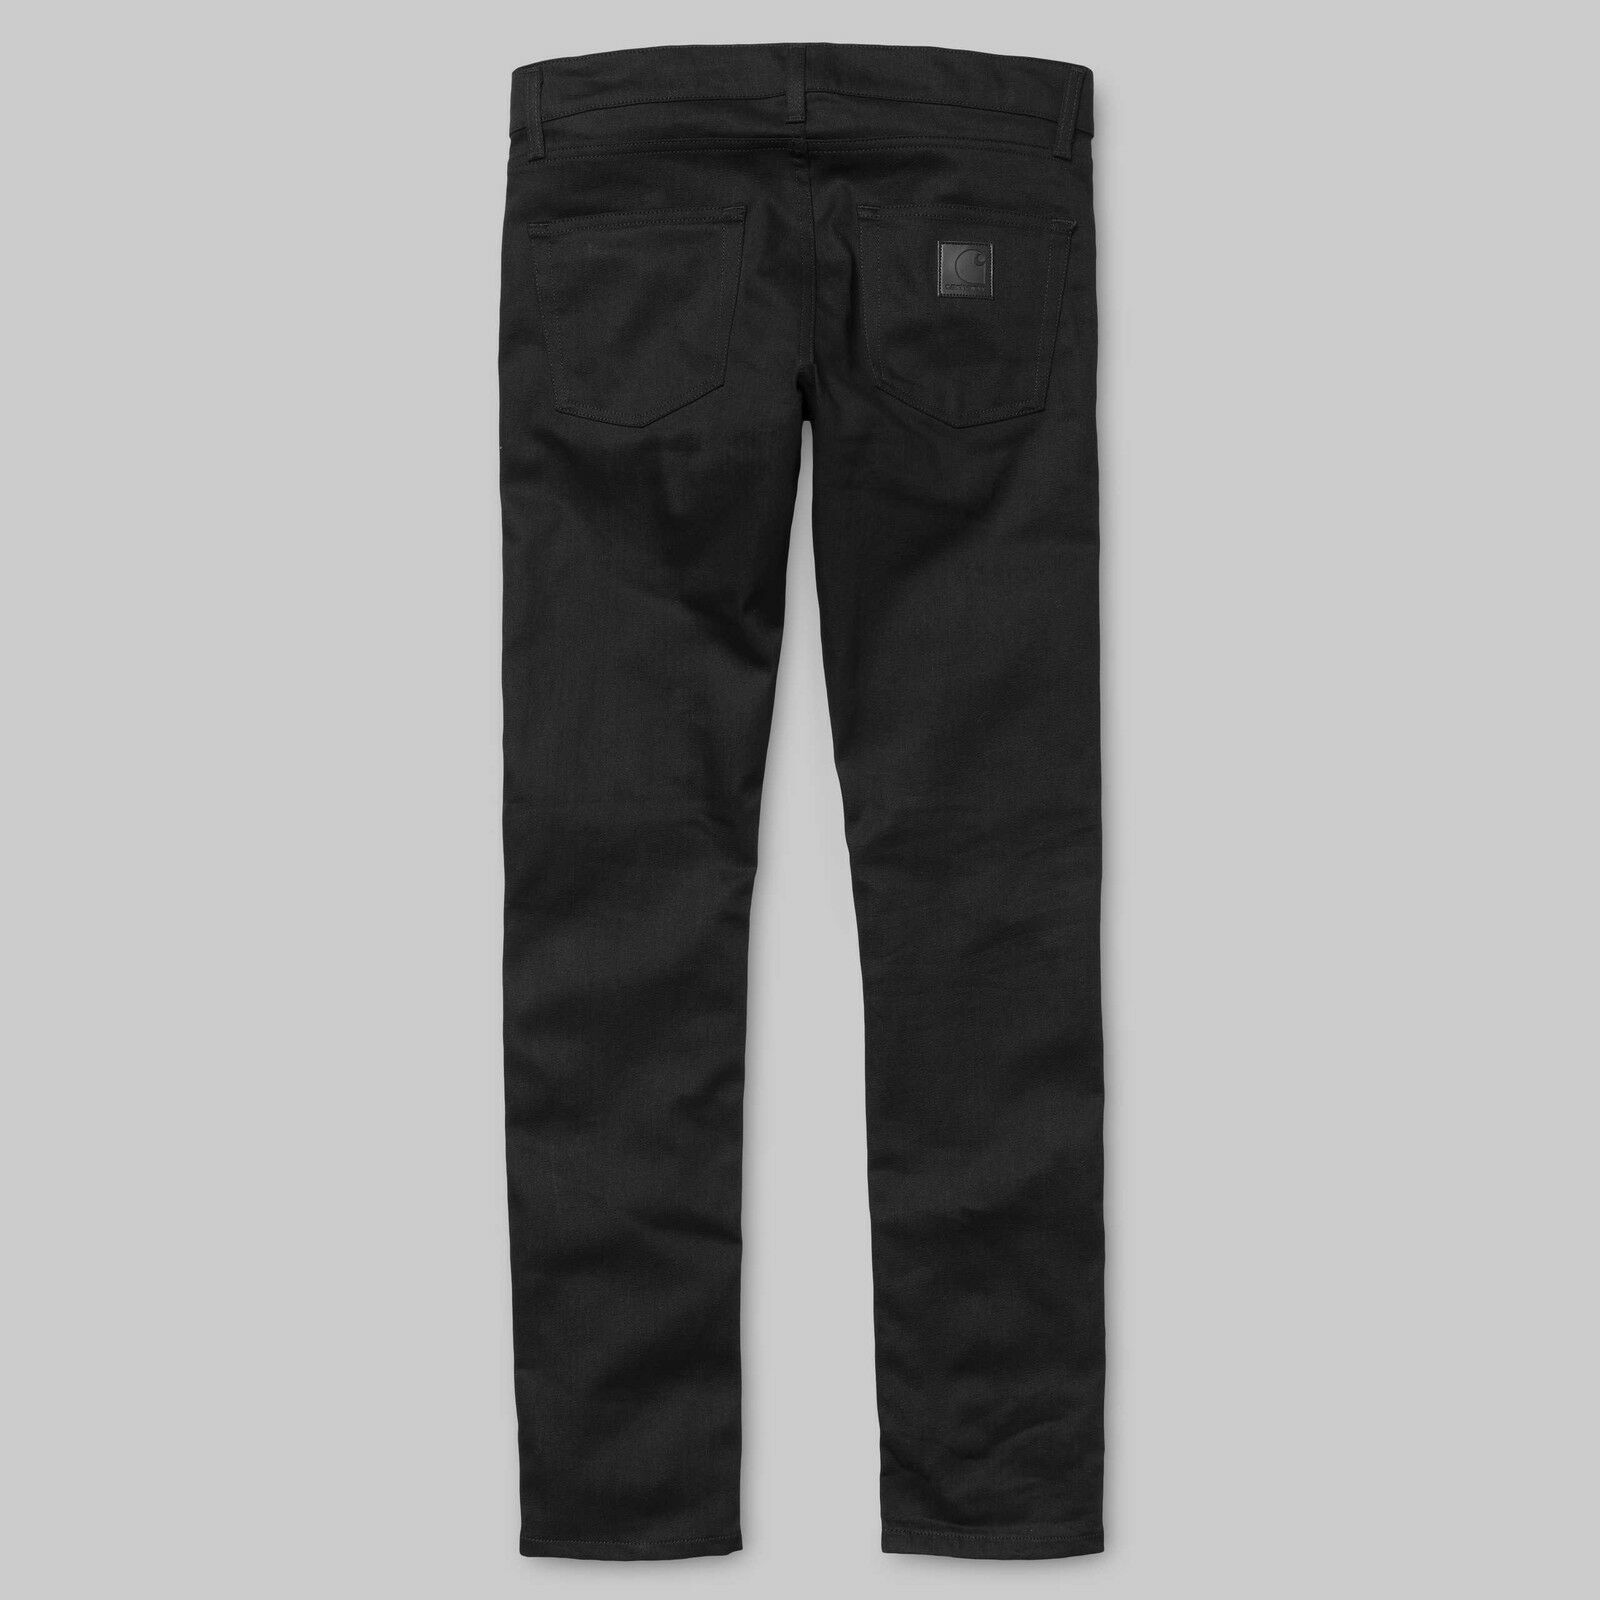 ... Carhartt Wip Rebel slim Pantalone Jeans Denim Rigida slim Rebel nera  modello affusolato Raw d8f020 f38231324f05